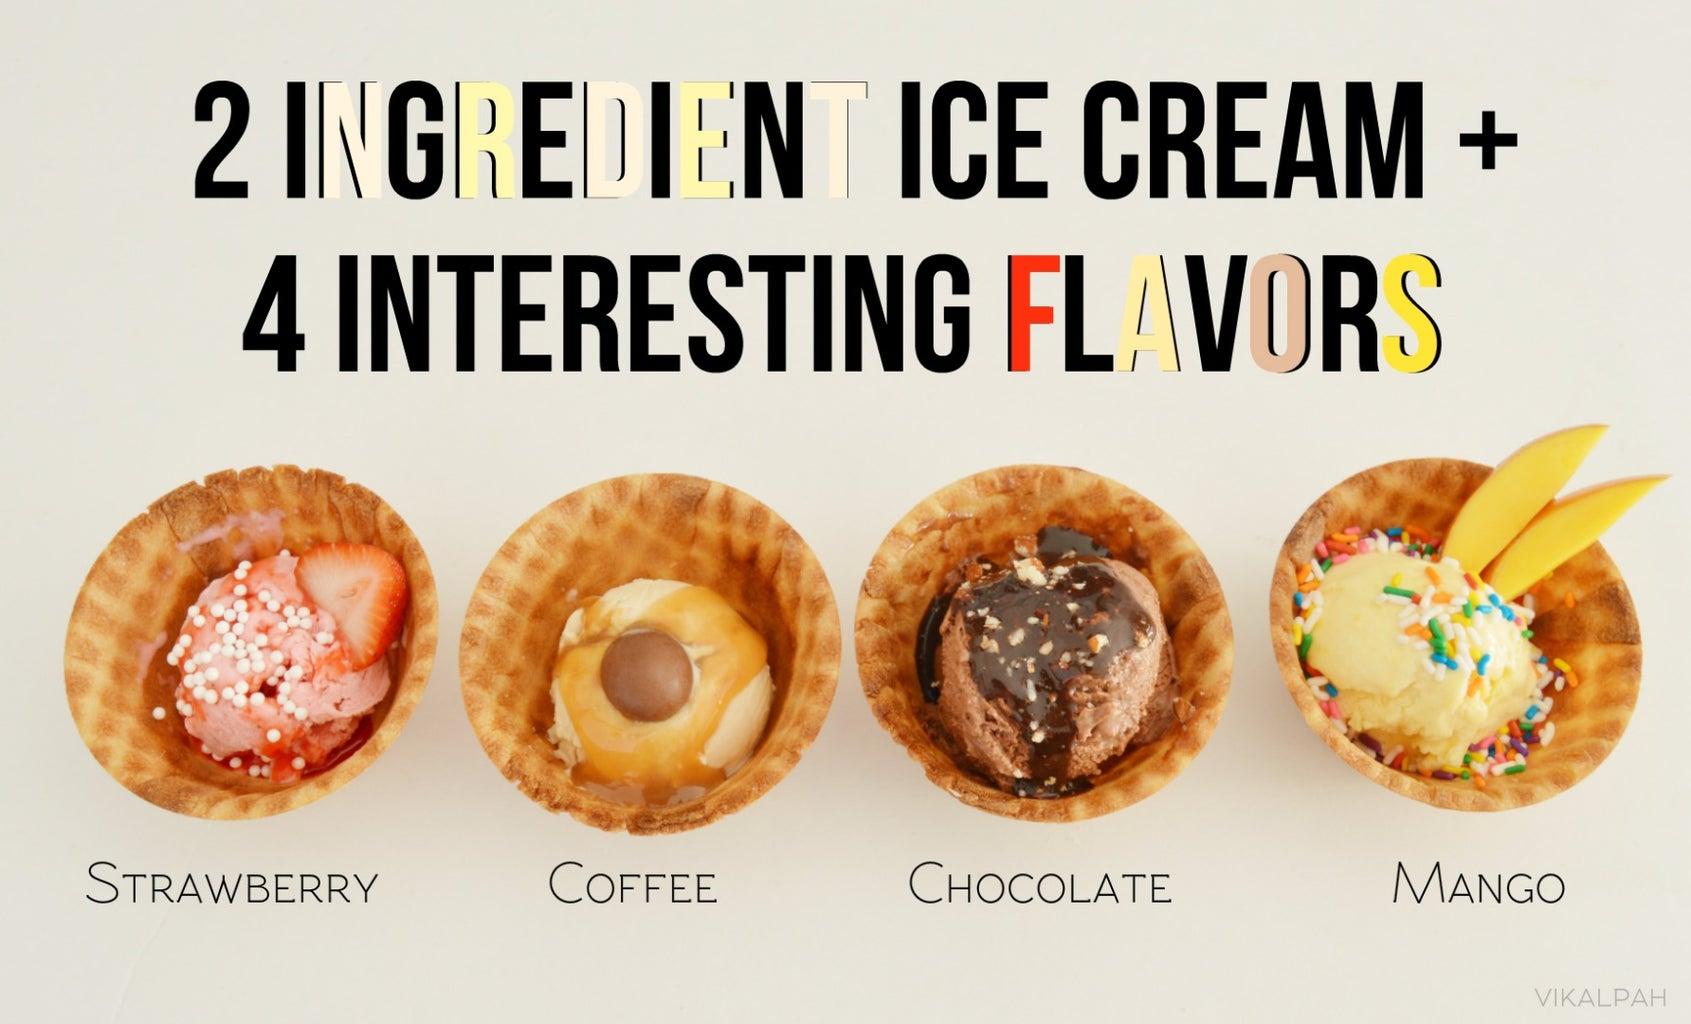 2 Ingredient Ice Cream + 4 Interesting Flavors